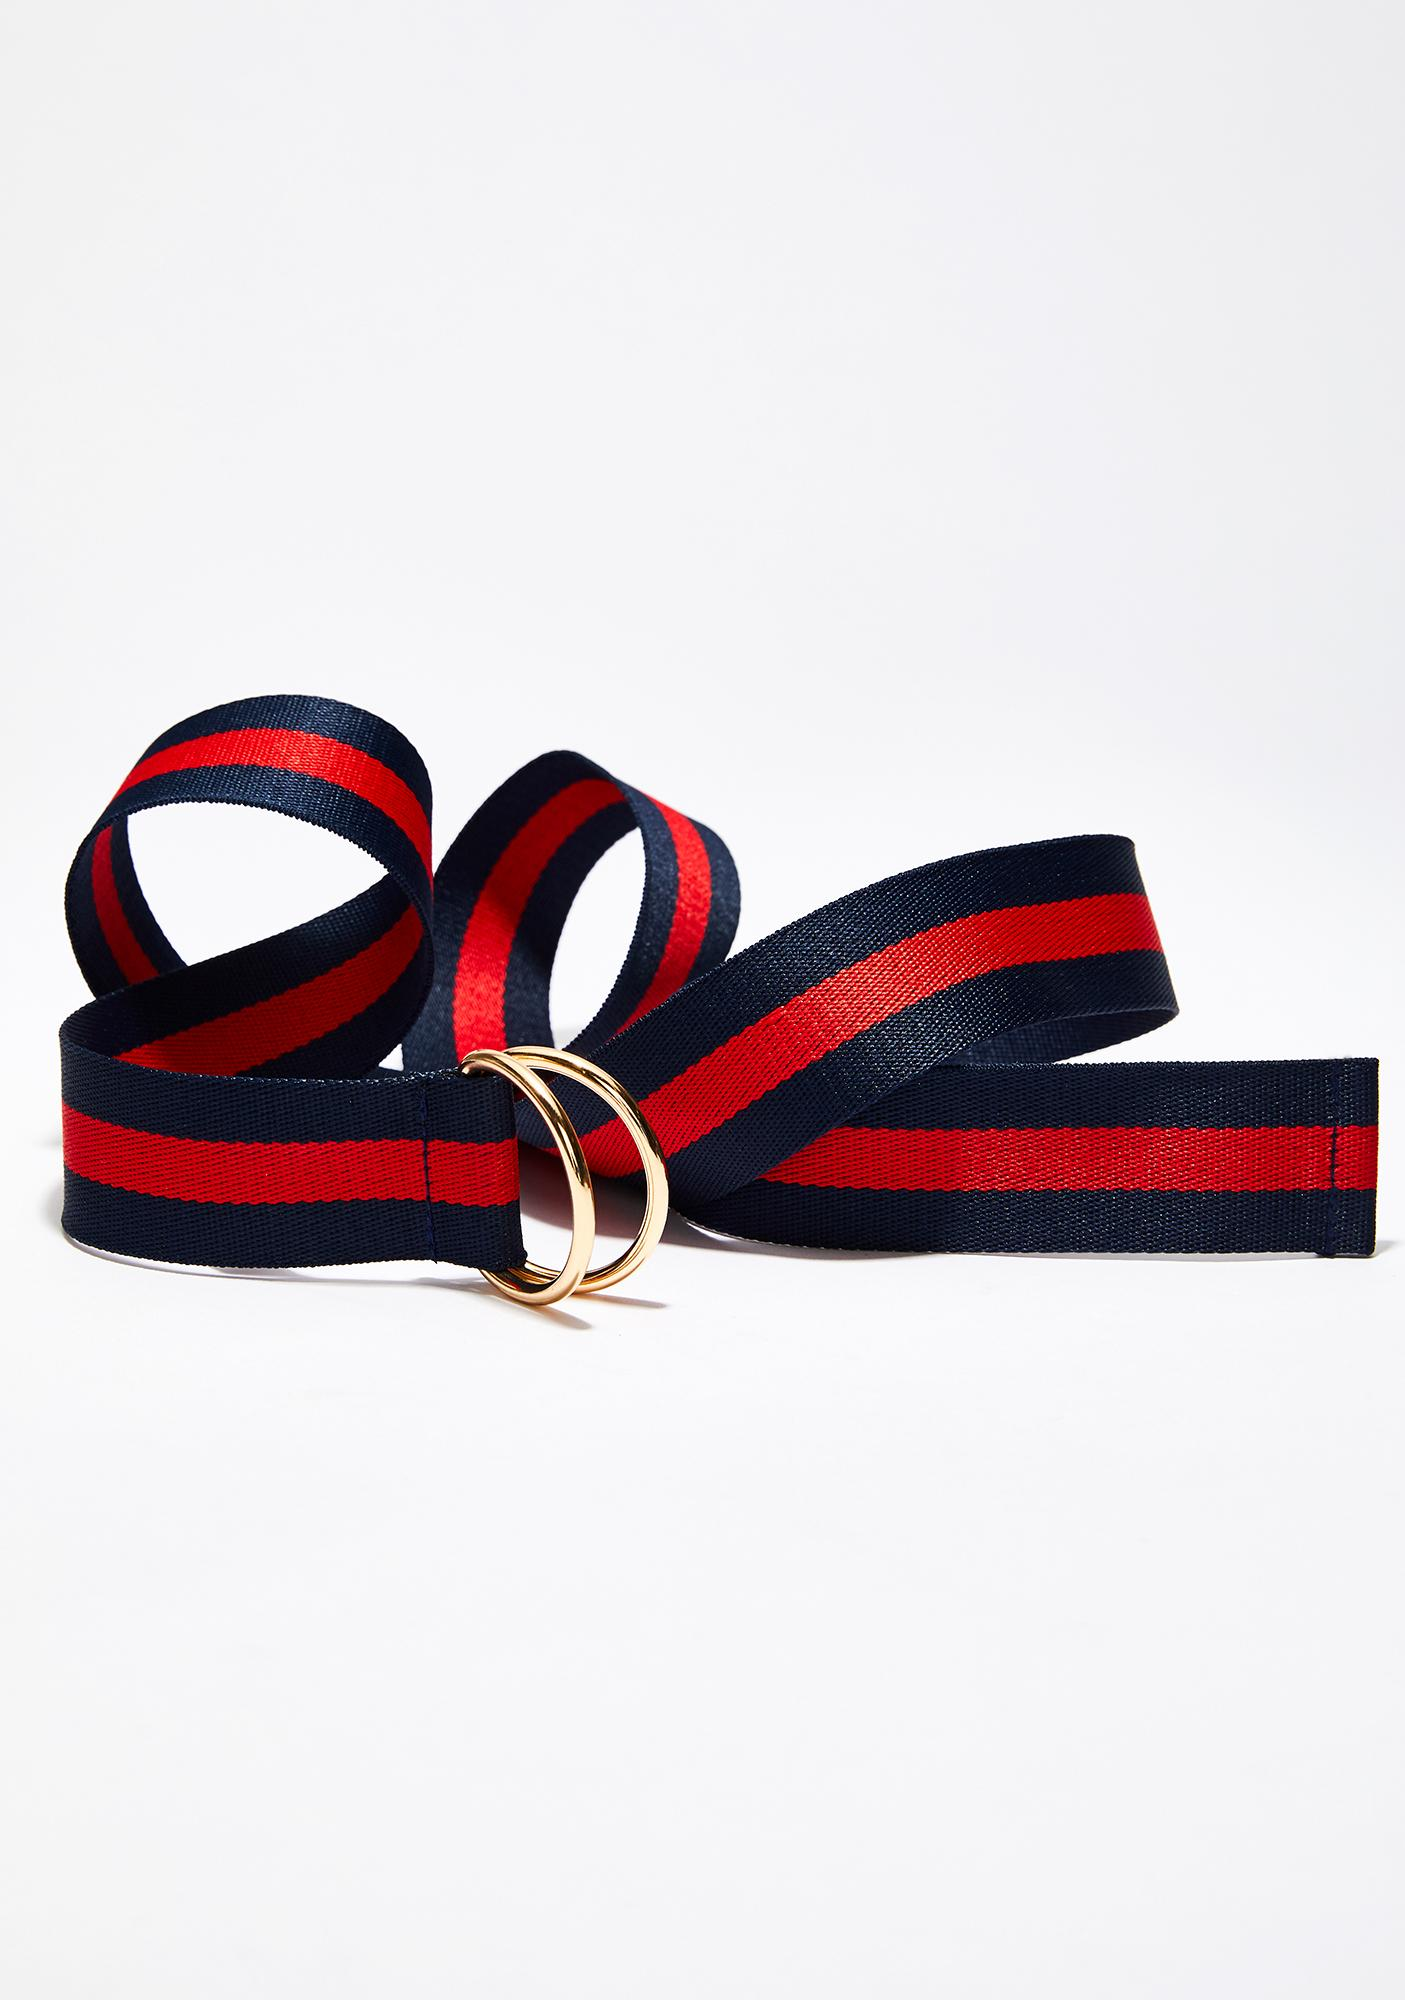 Blurred Lines Belt by Illuma Fashion